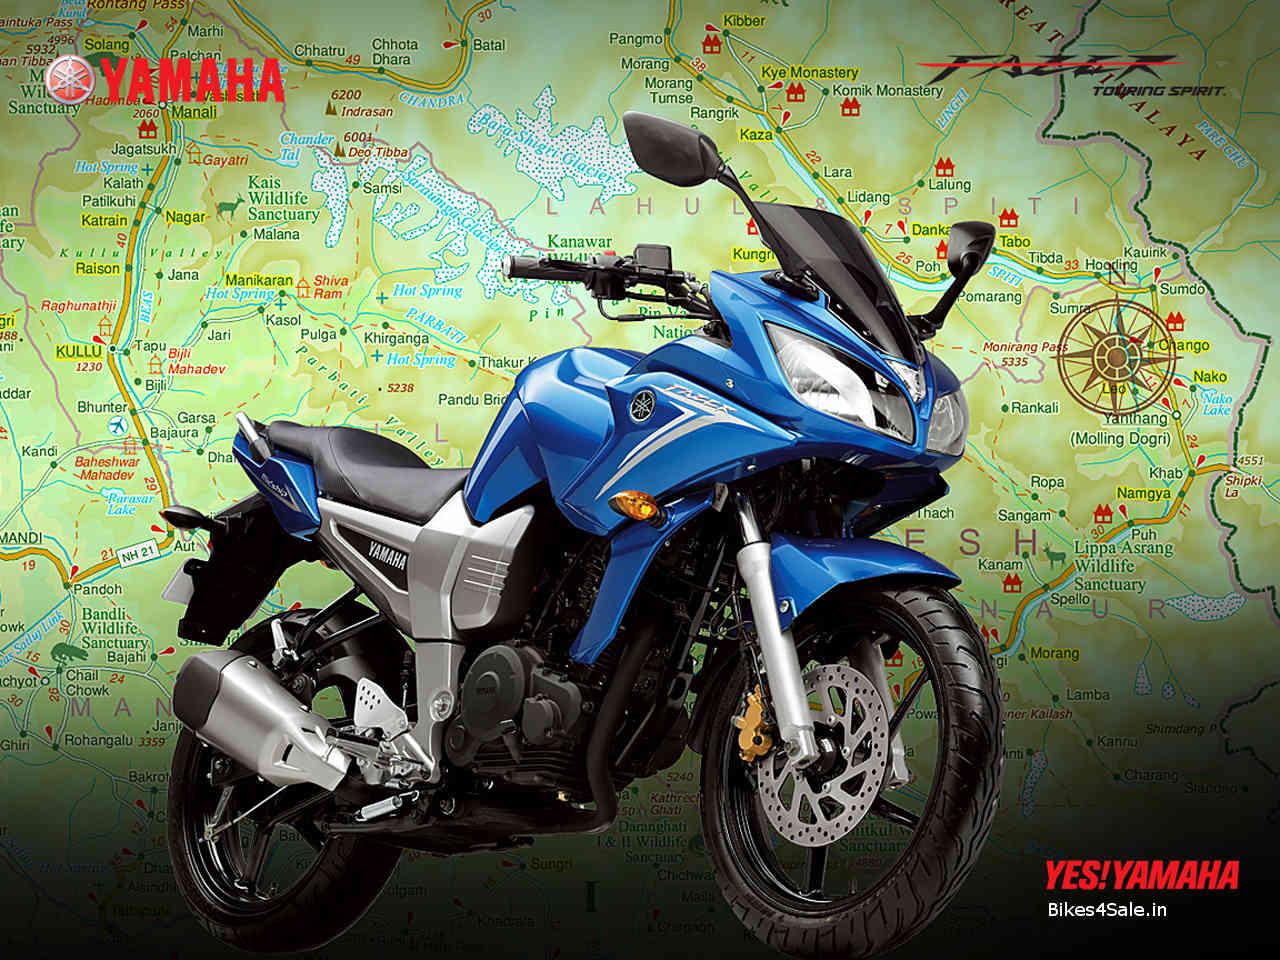 Yamaha Fazer 150 Wallpaper